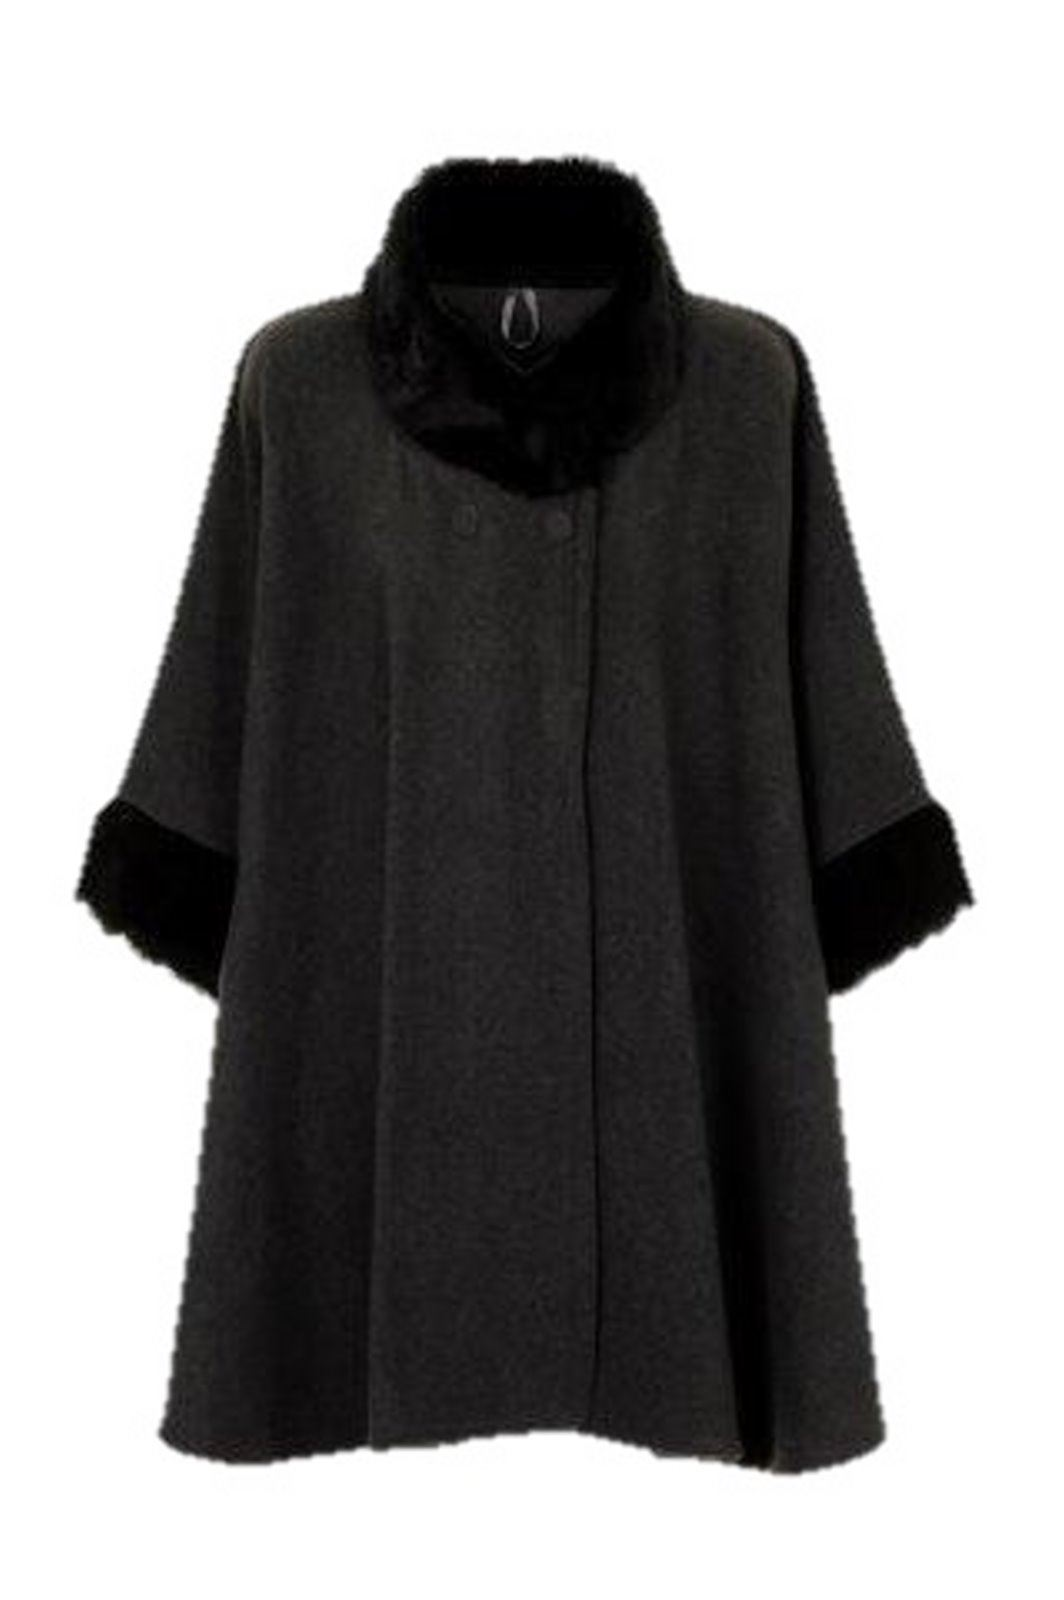 damen webpelz fleece poncho cape mantel bergr e ebay. Black Bedroom Furniture Sets. Home Design Ideas